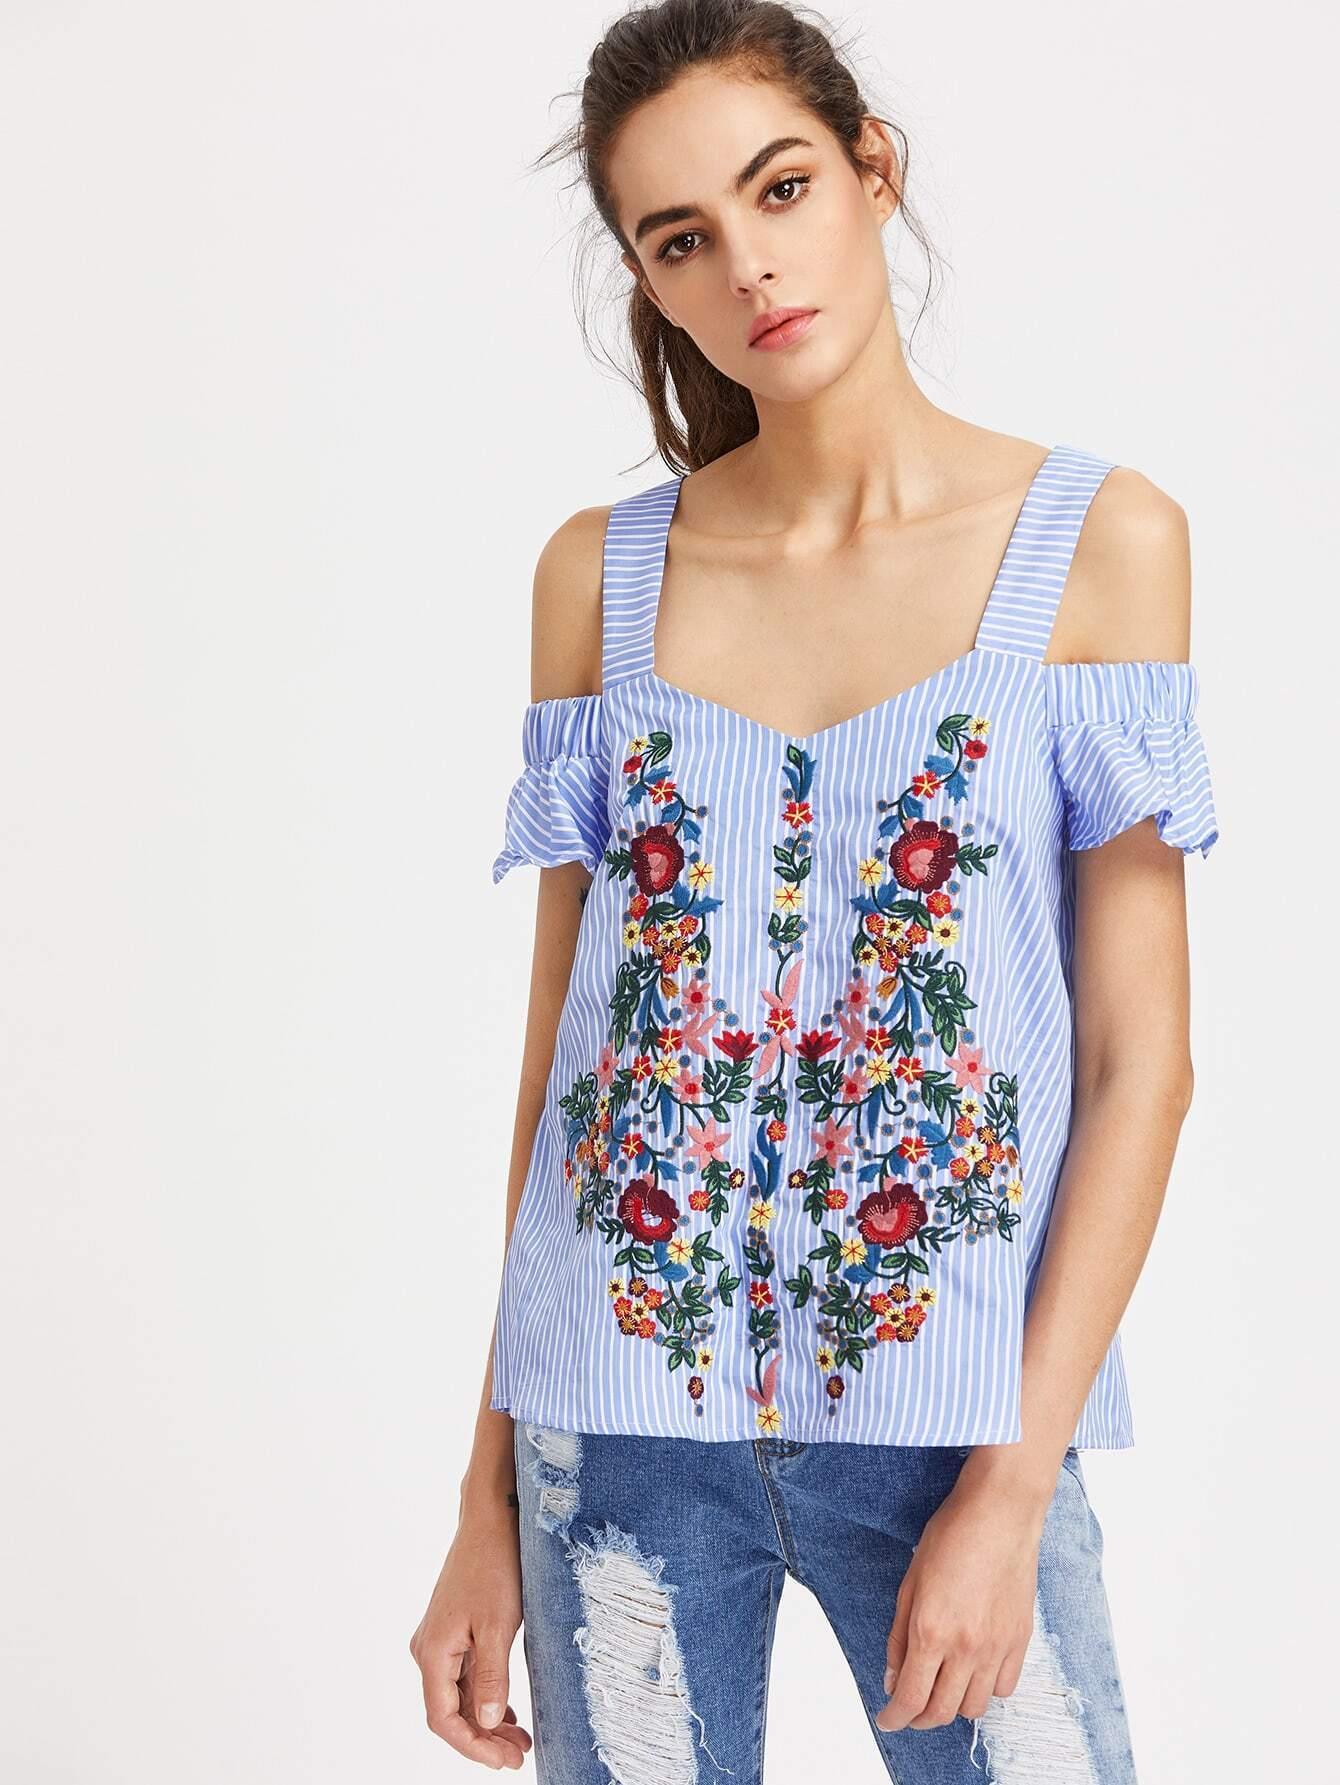 blouse170502702_2